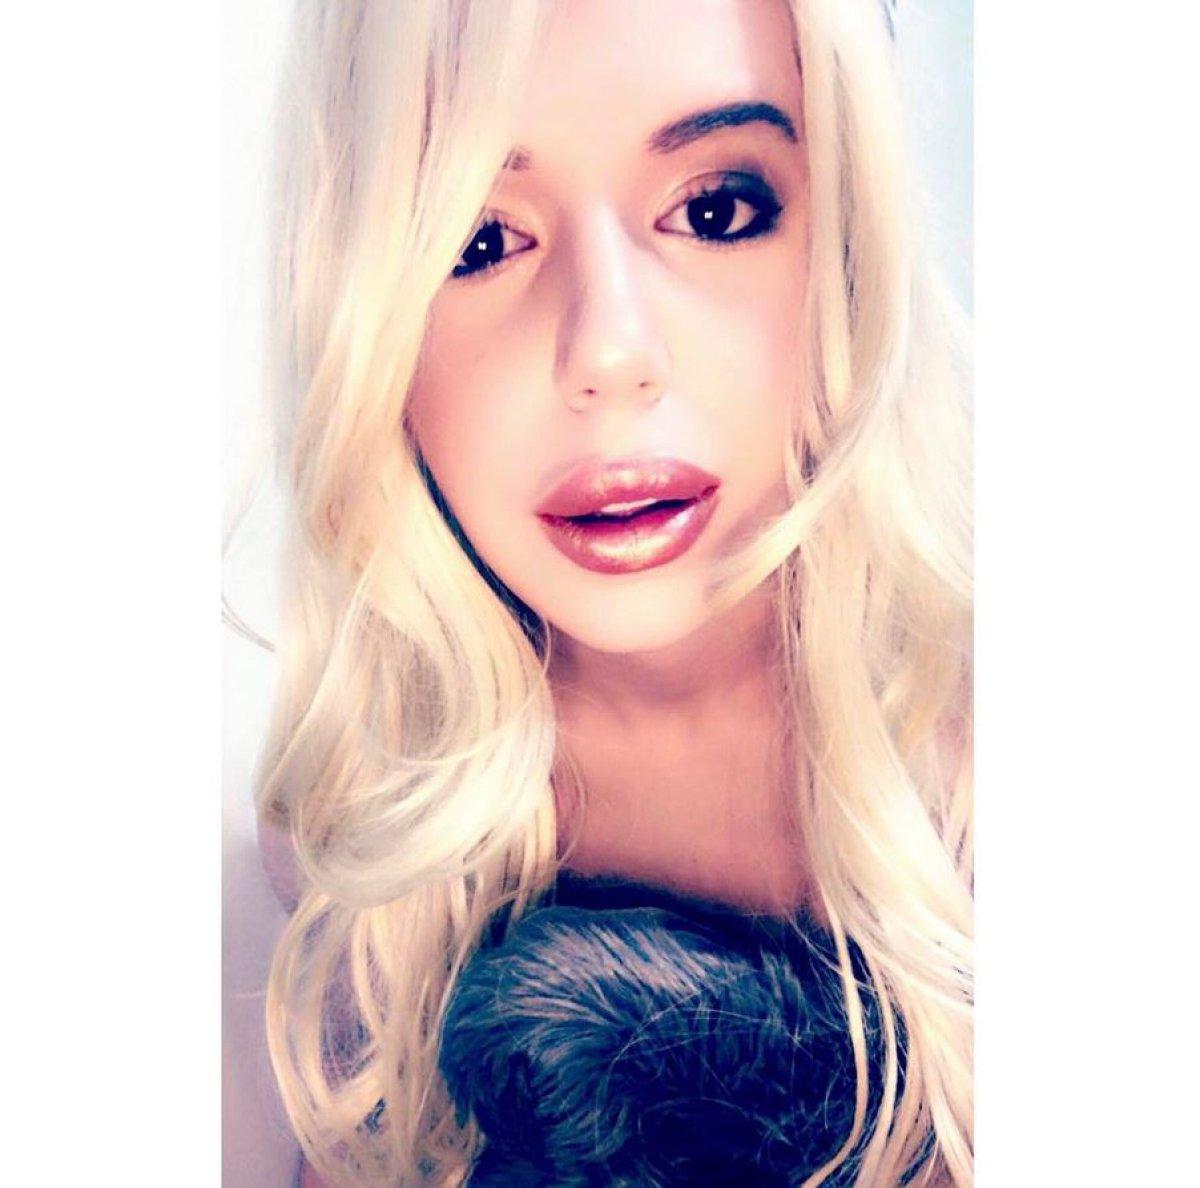 Se opera 90 veces para ser Britney Spears pero...¿se parece?